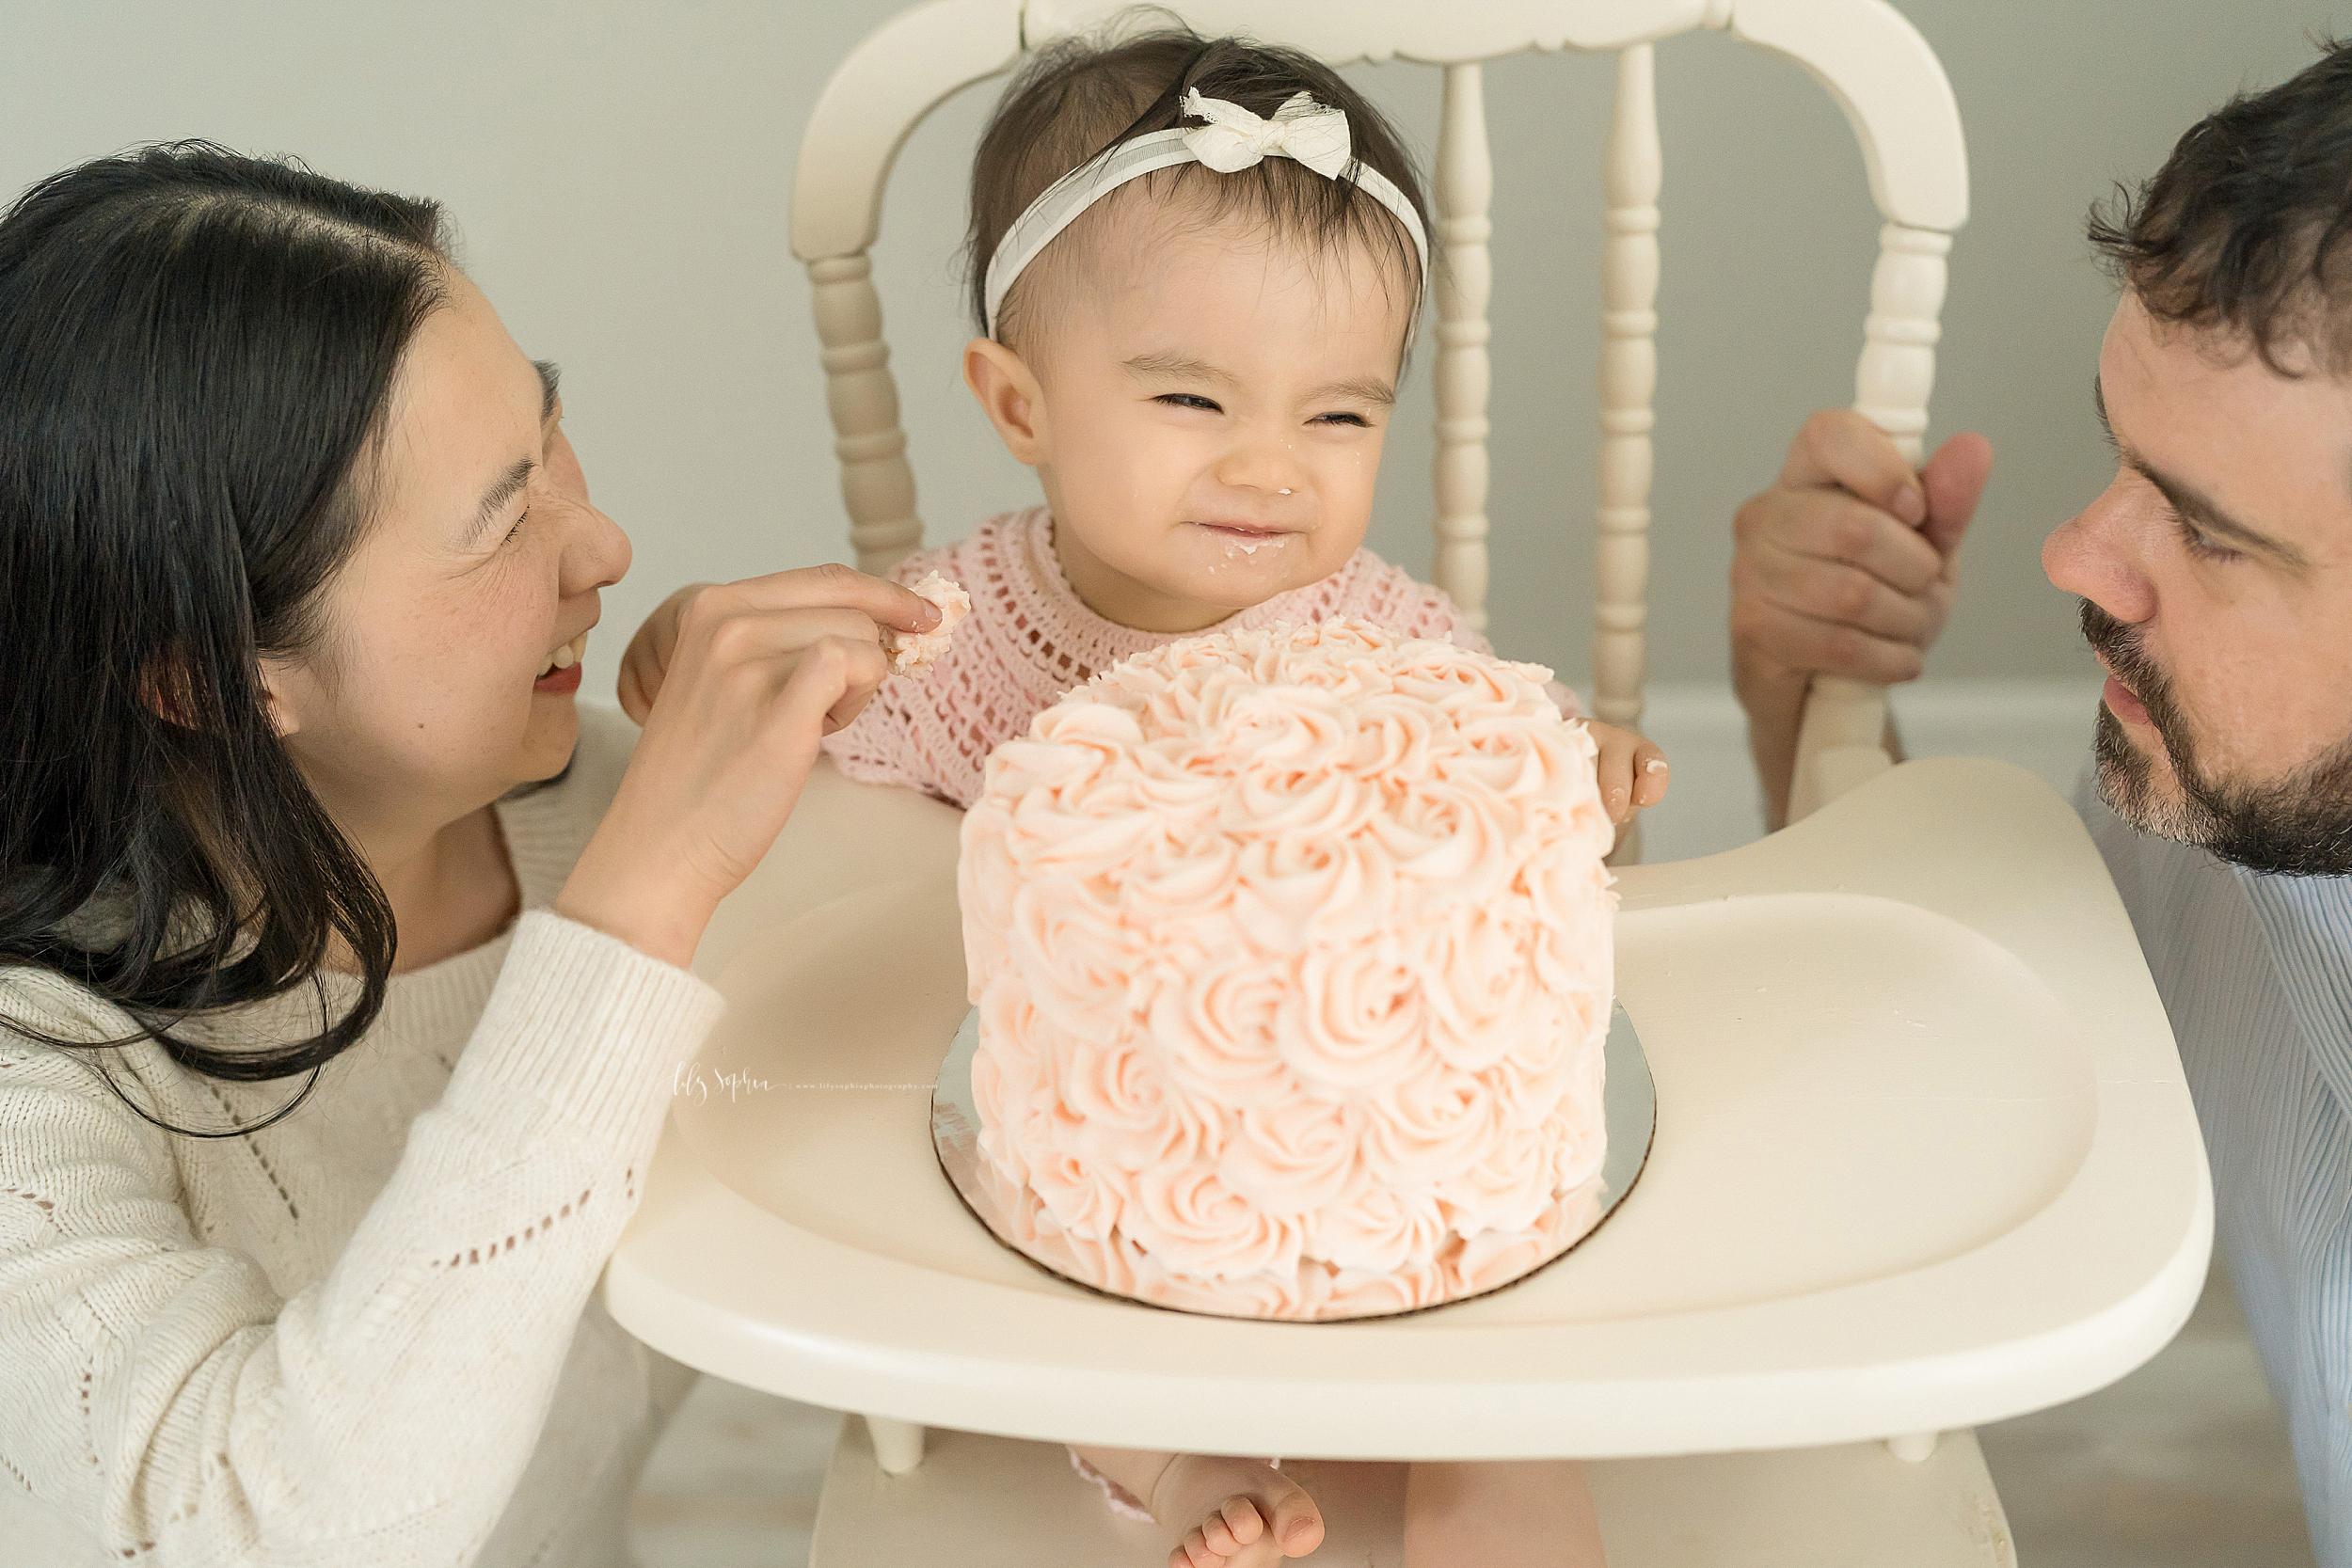 atlanta-sandy-springs-brookhaven-virginia-highlands-smyrna-decatur-lily-sophia-photography-milestone-first-birthday-toddler-girl-family-atlanta-cake-smash_0877.jpg